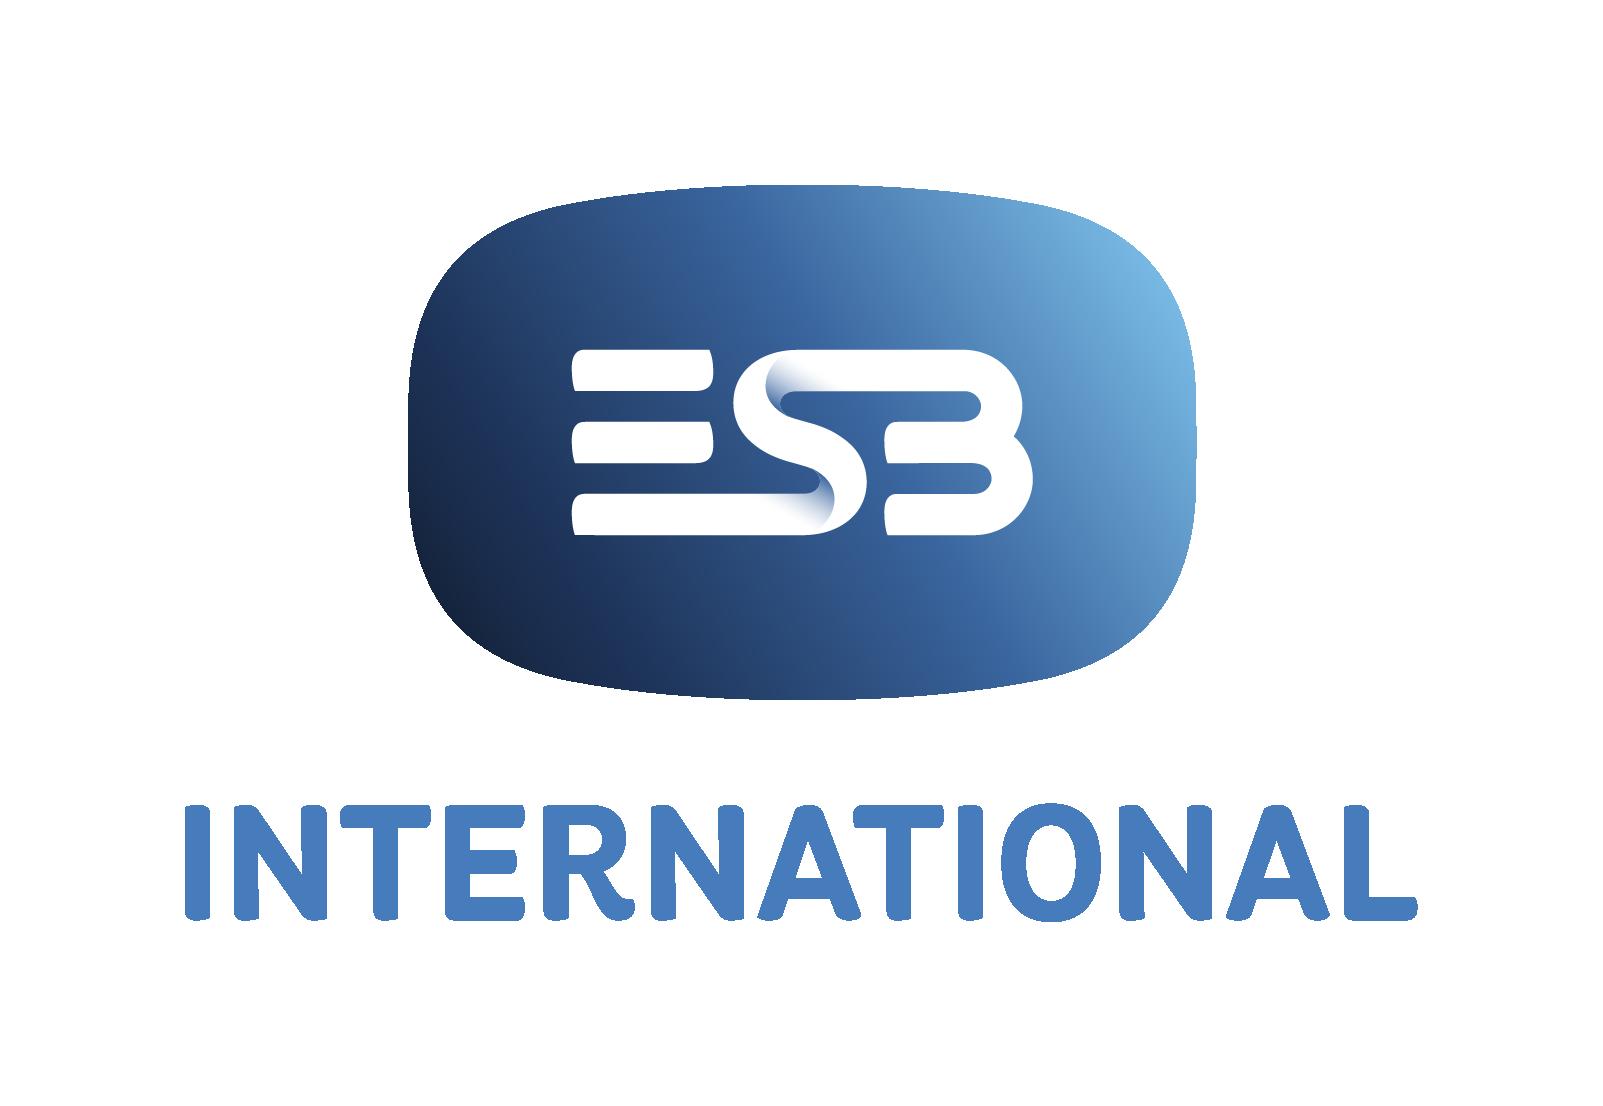 Meet ESB International at Jobs Expo Cork